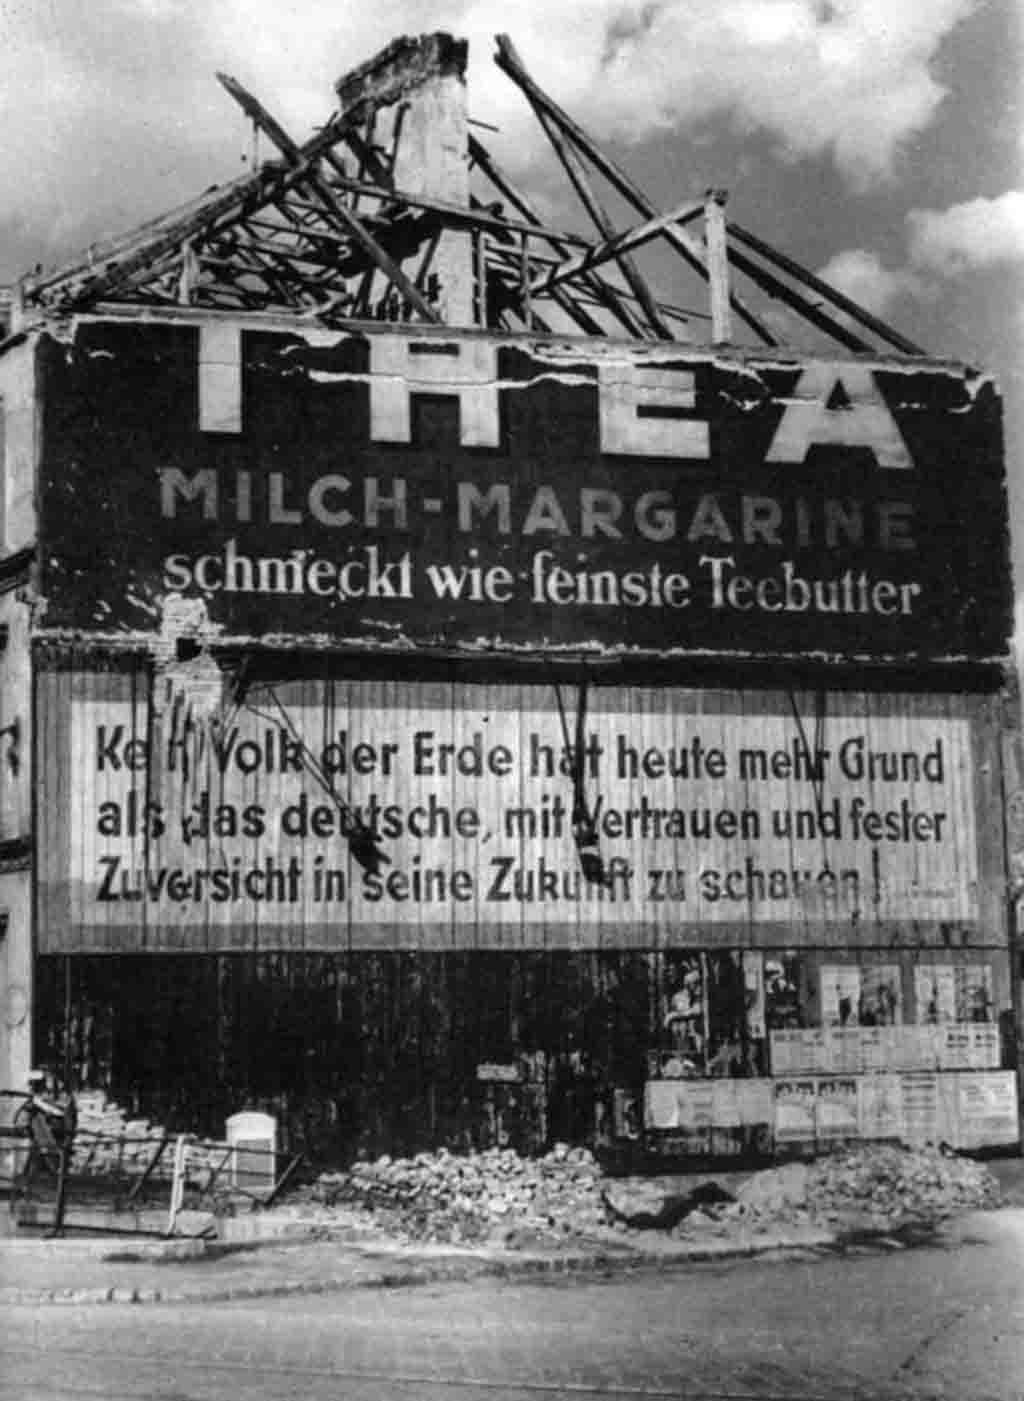 Nazi agitational poster